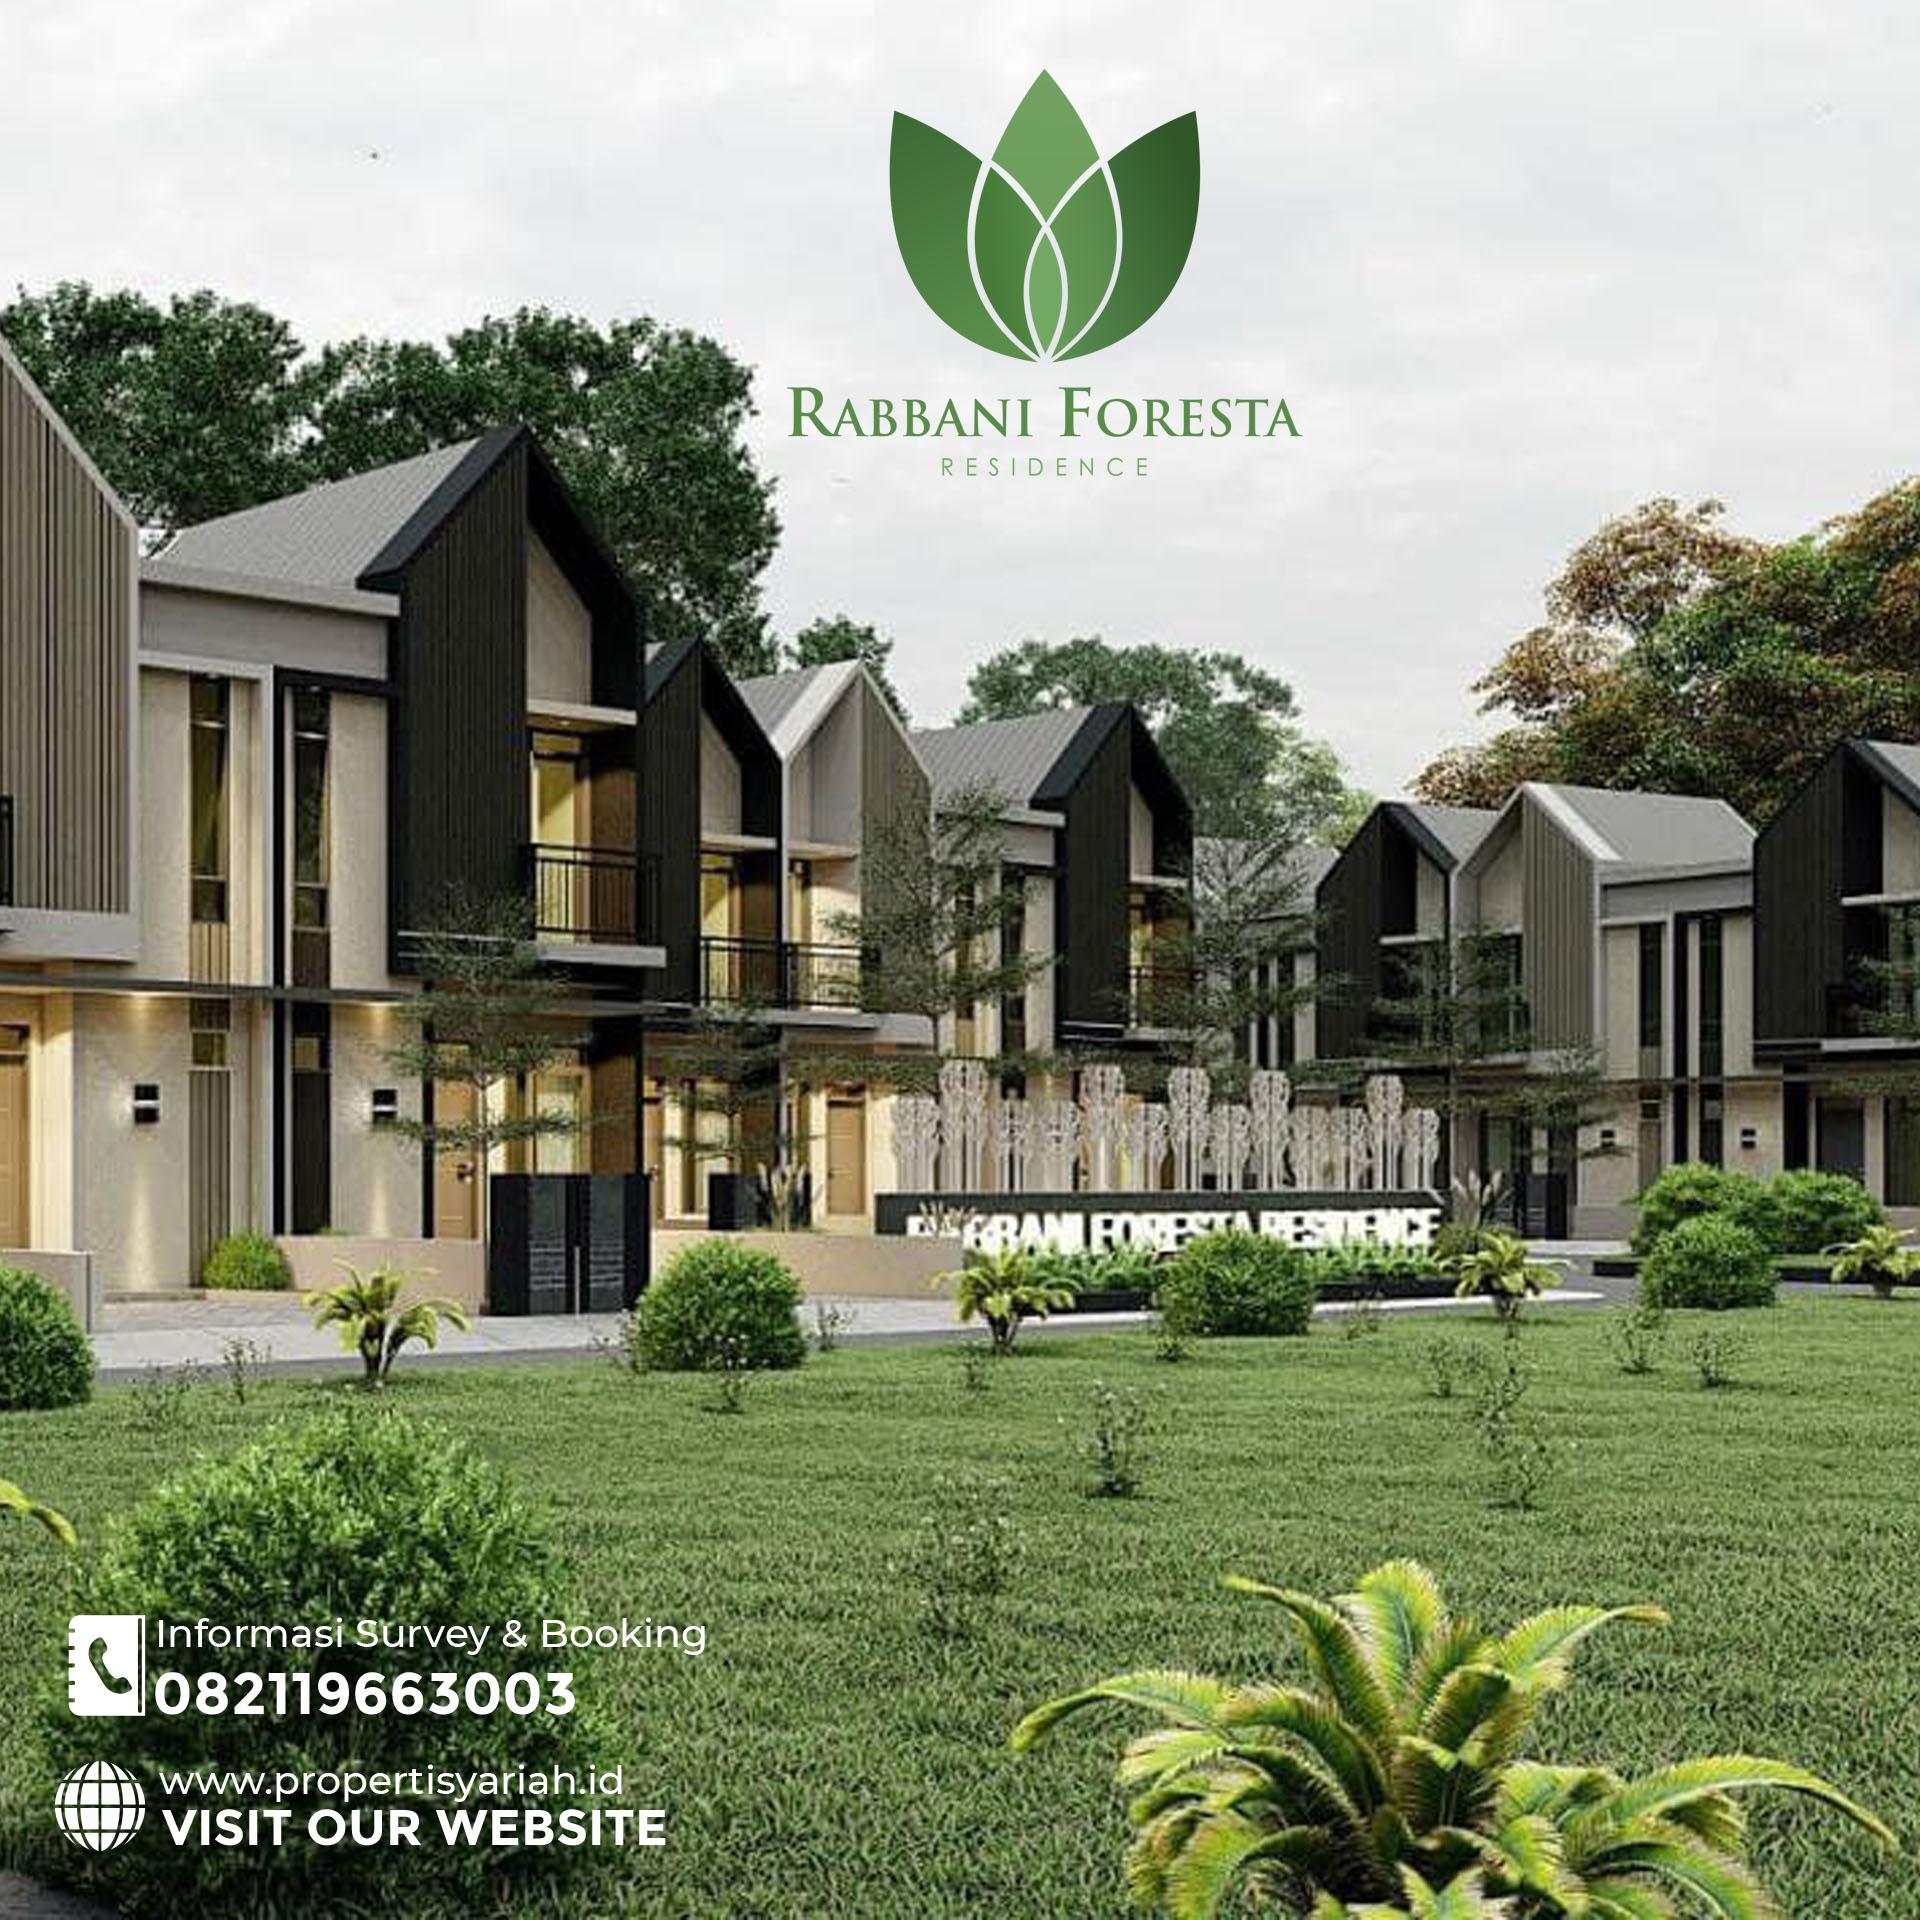 Rabbani Foresta Residence, Hunian Islami Super Strategis Kota Bogor